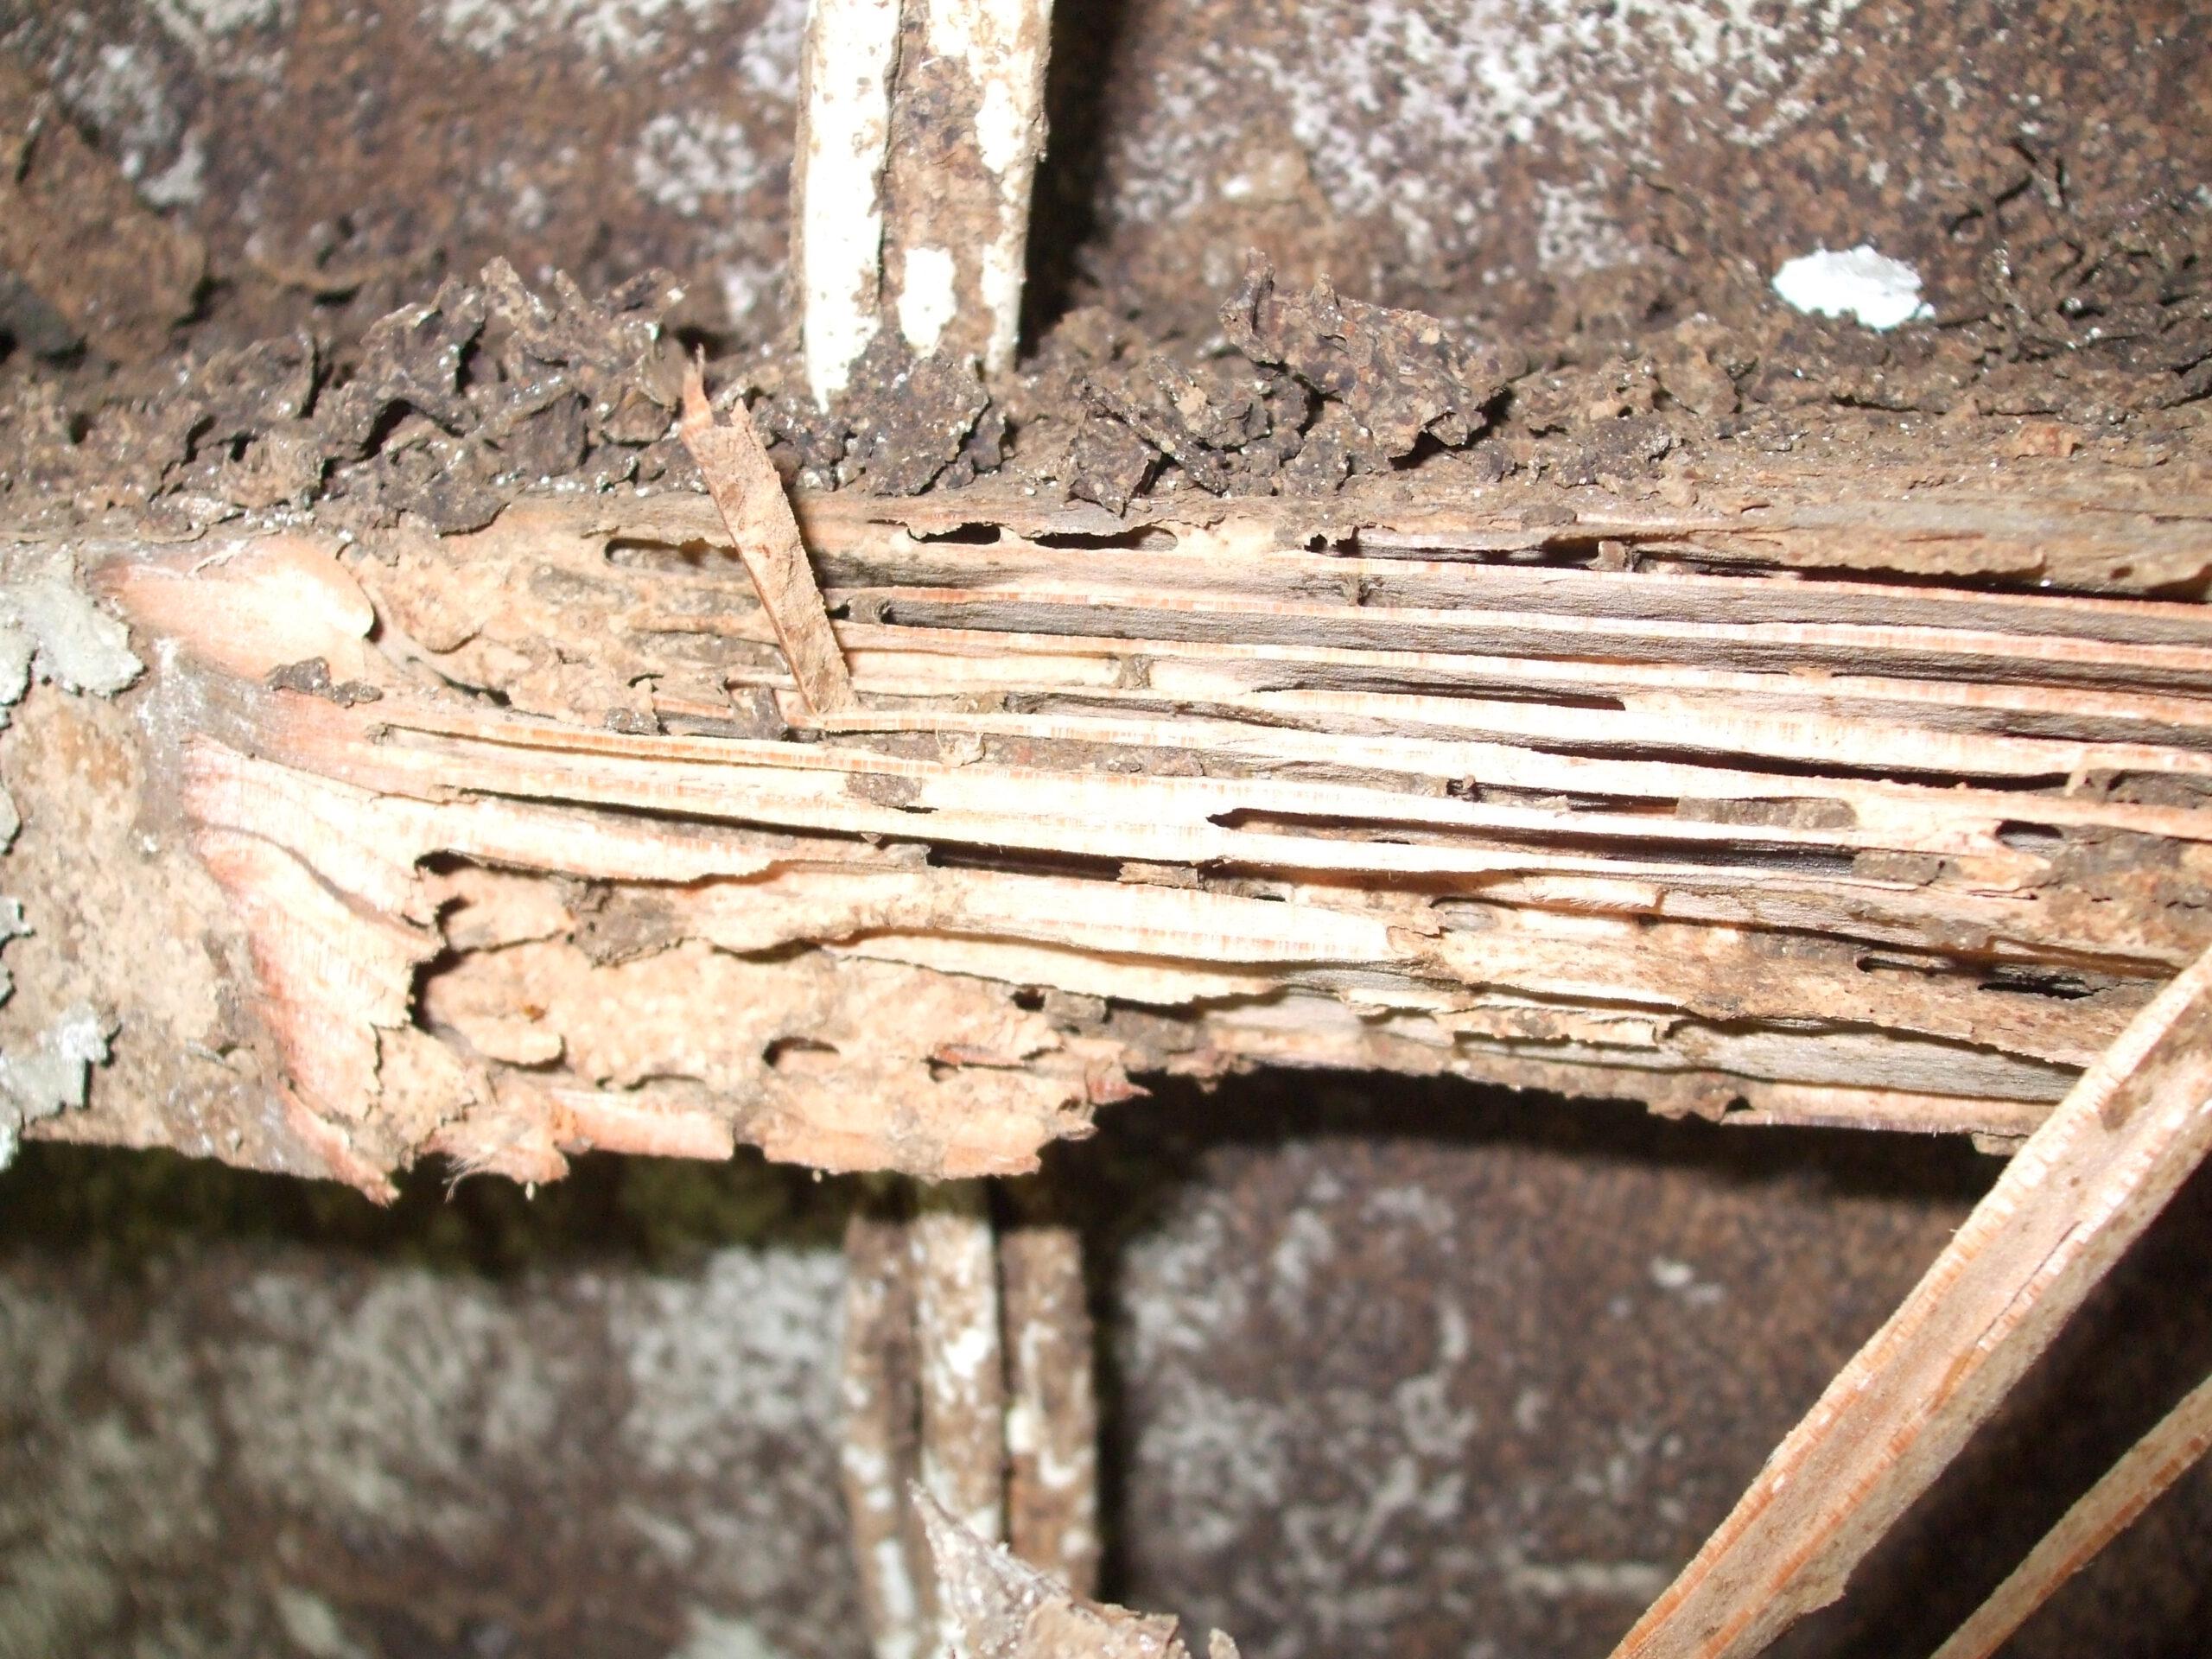 Termite Pest Control,Termite Control Sydney,Termite Inspections,Termite Baiting,Termite Treatments